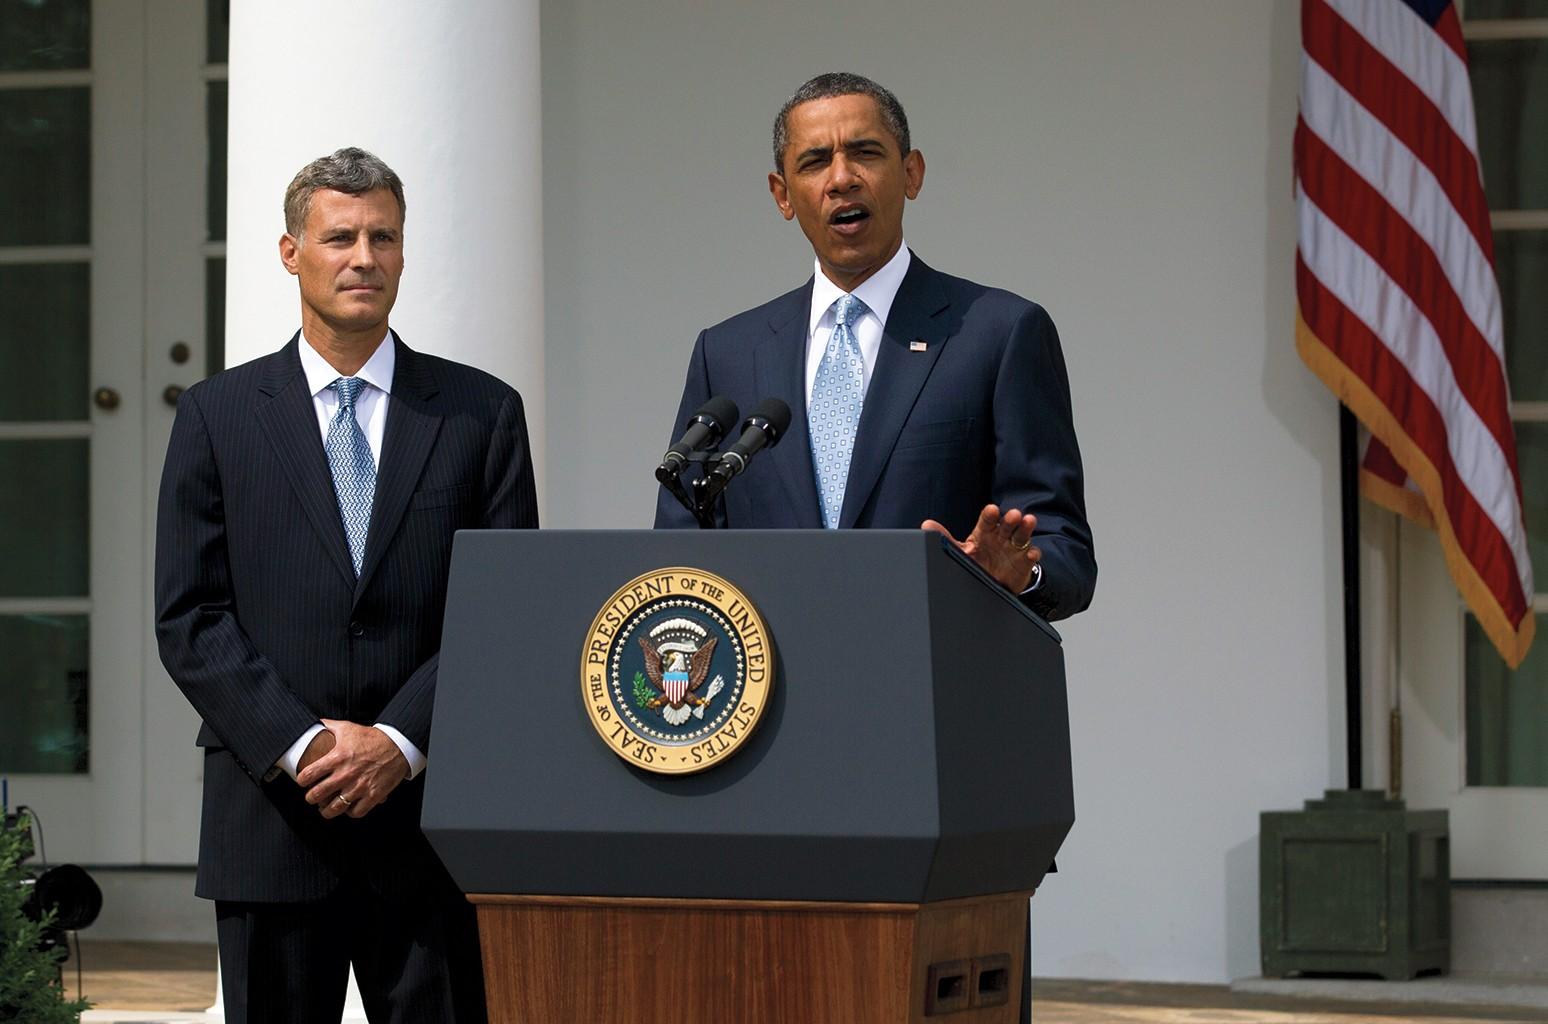 President Obama, 2011